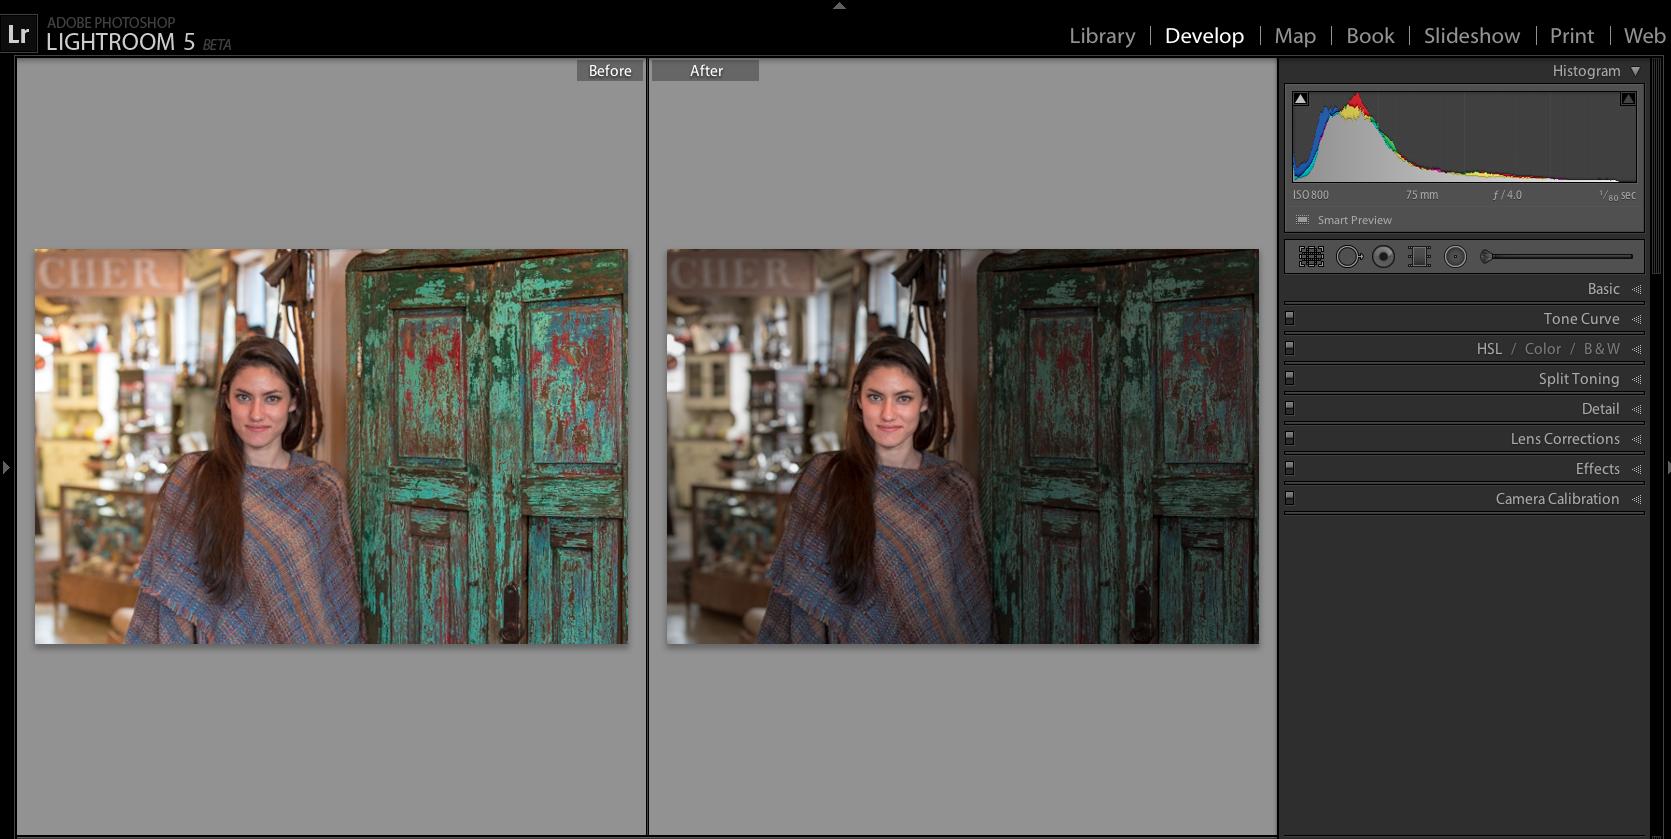 Download Adobe Photoshop Lightroom Beta 5